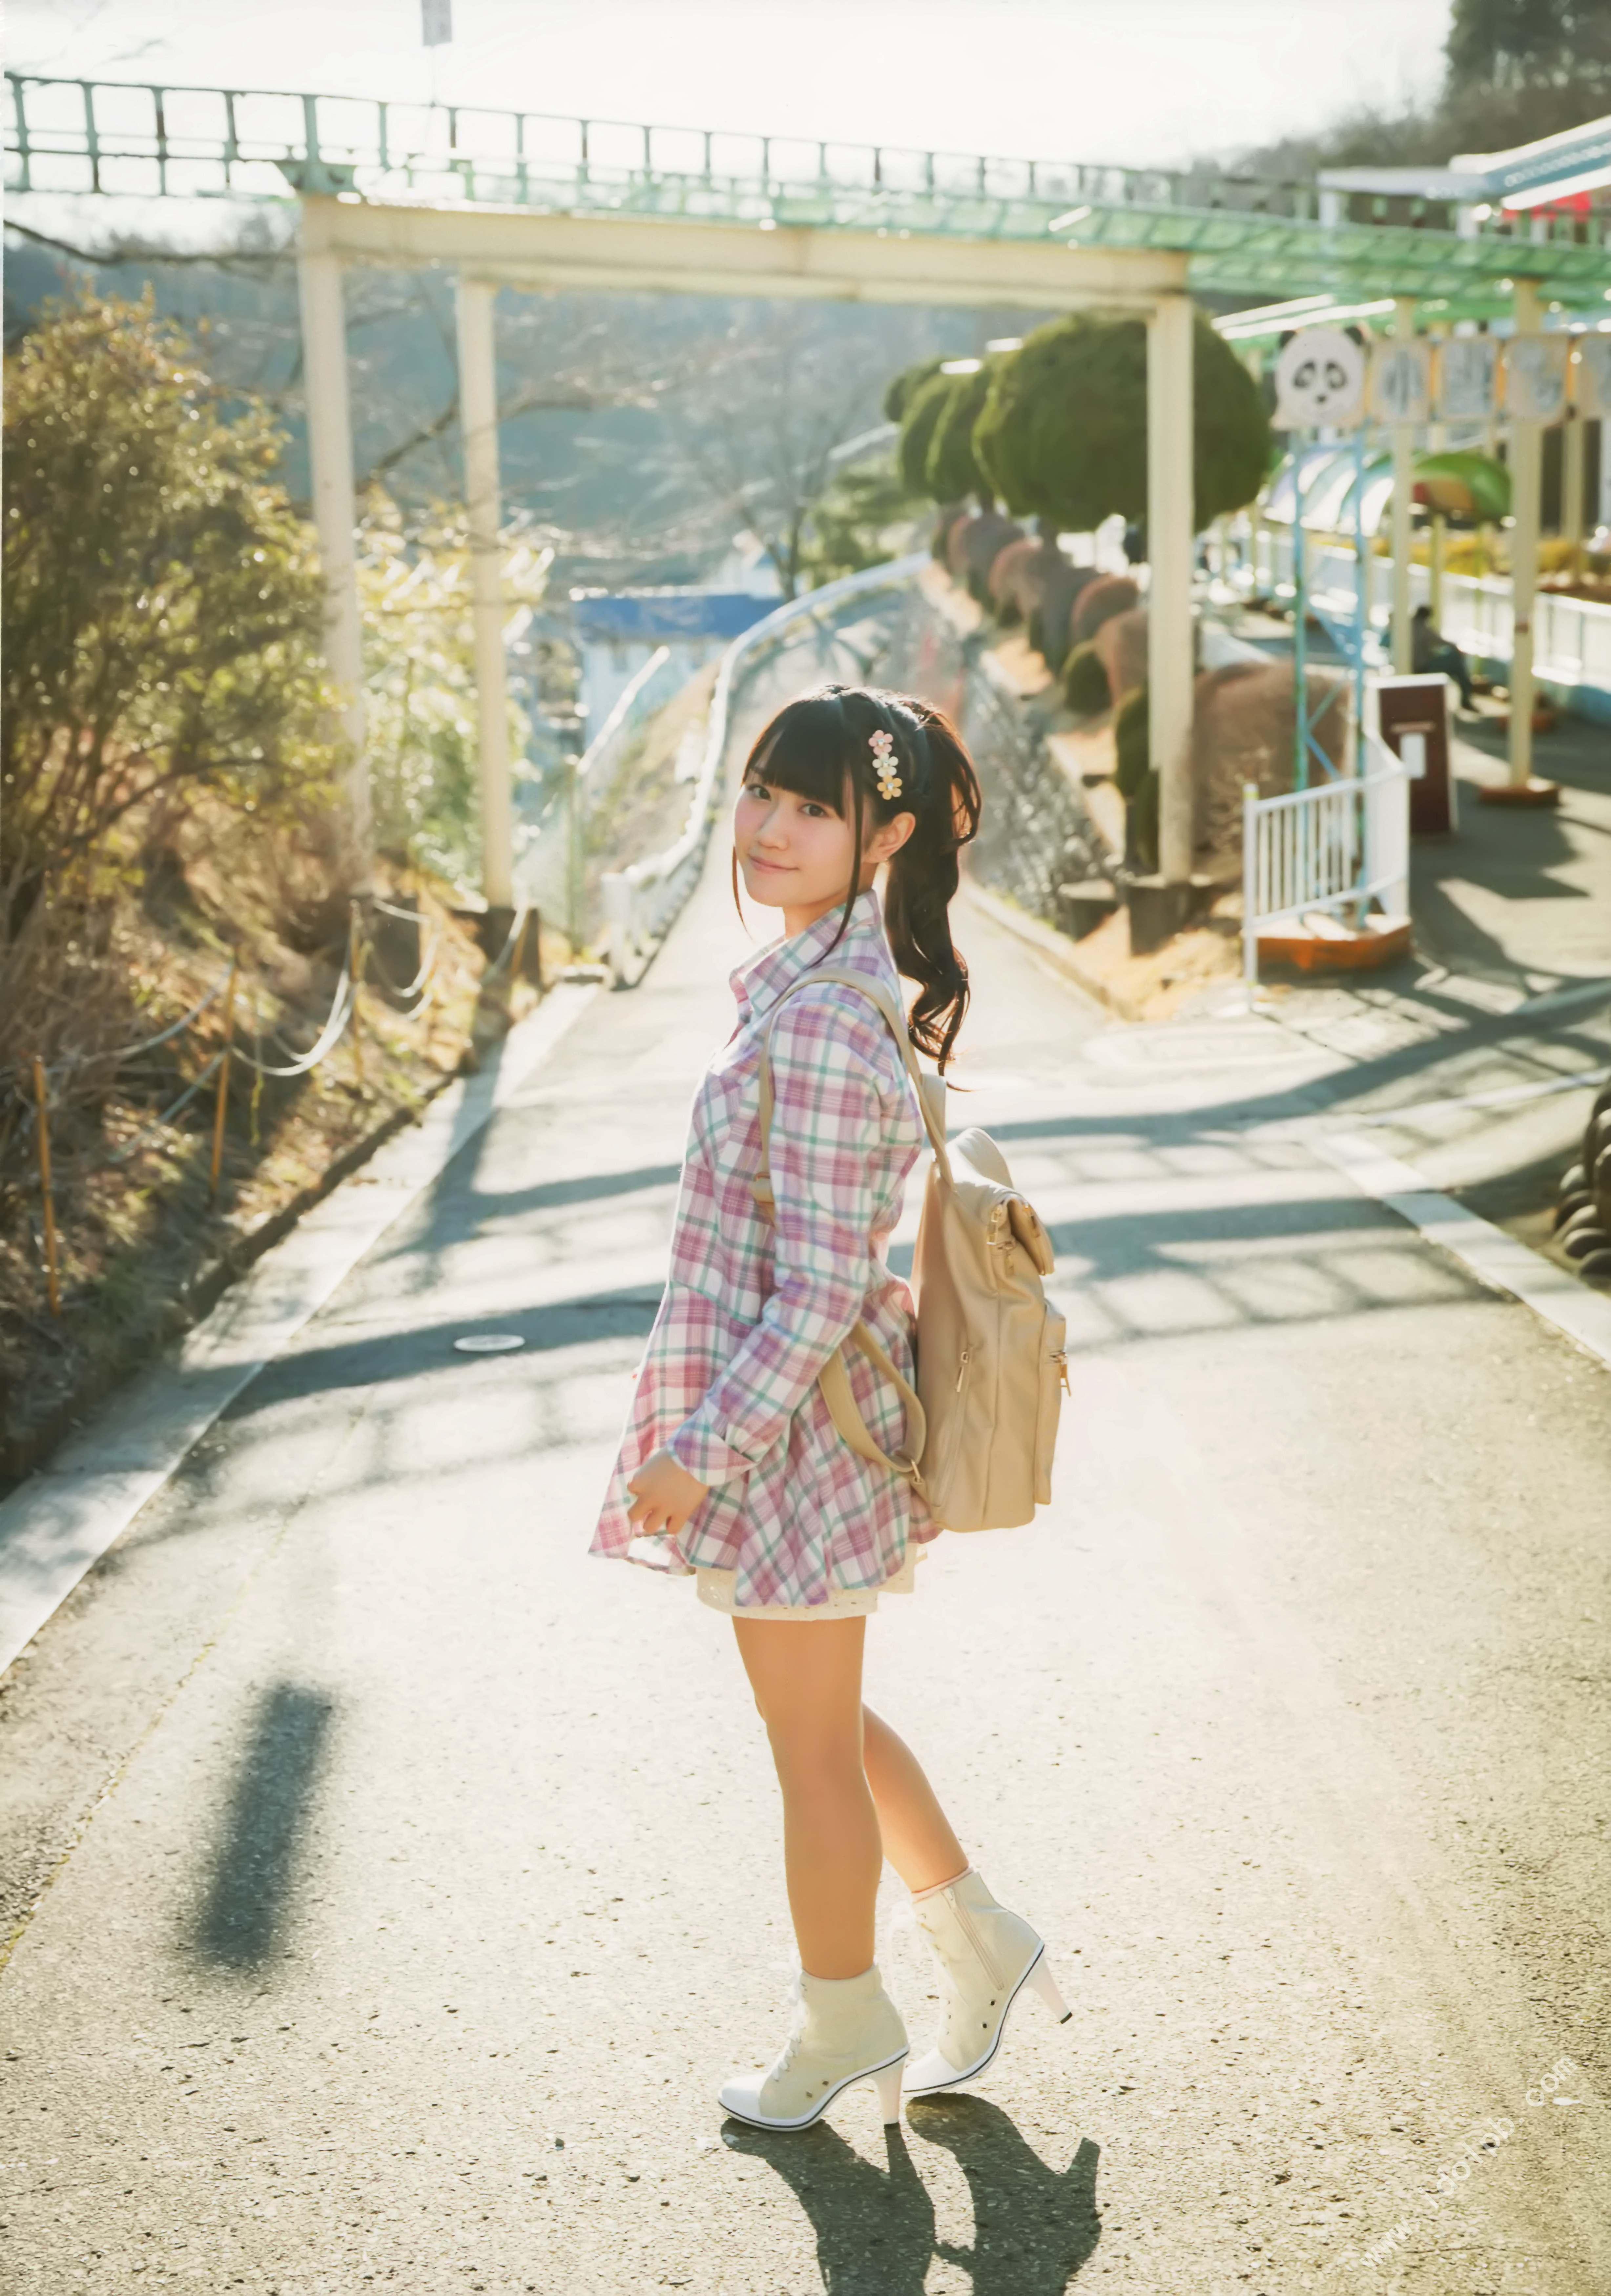 ogura_yui083.jpg